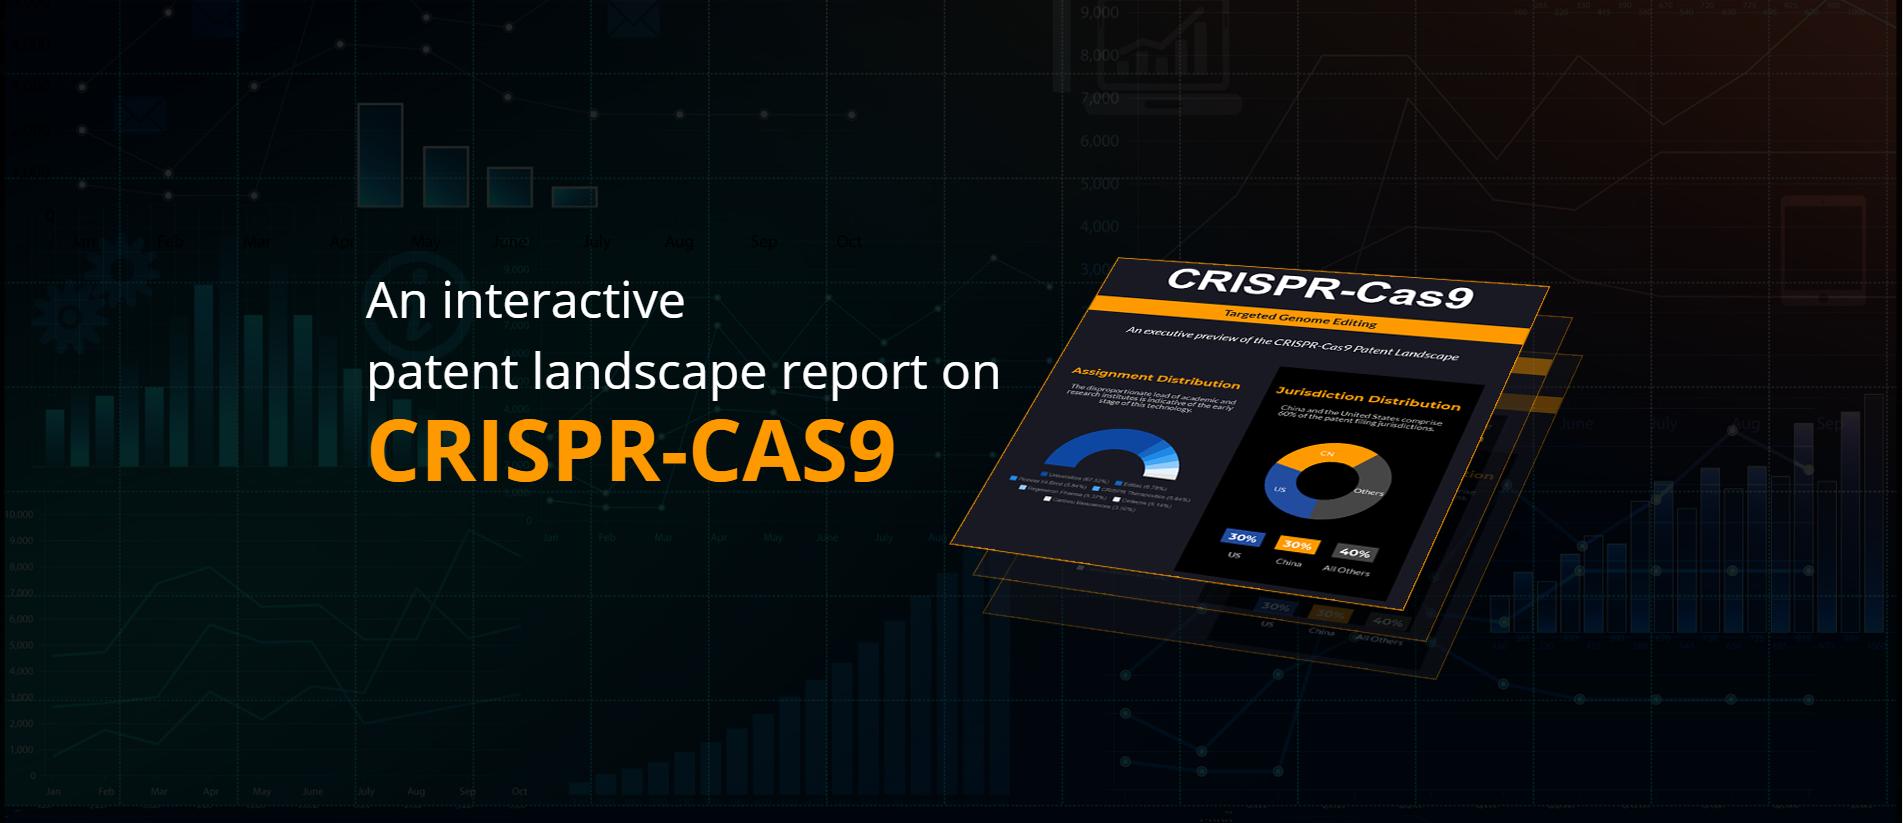 MaxVal Publishes Advanced CRISPR-Cas9 Report